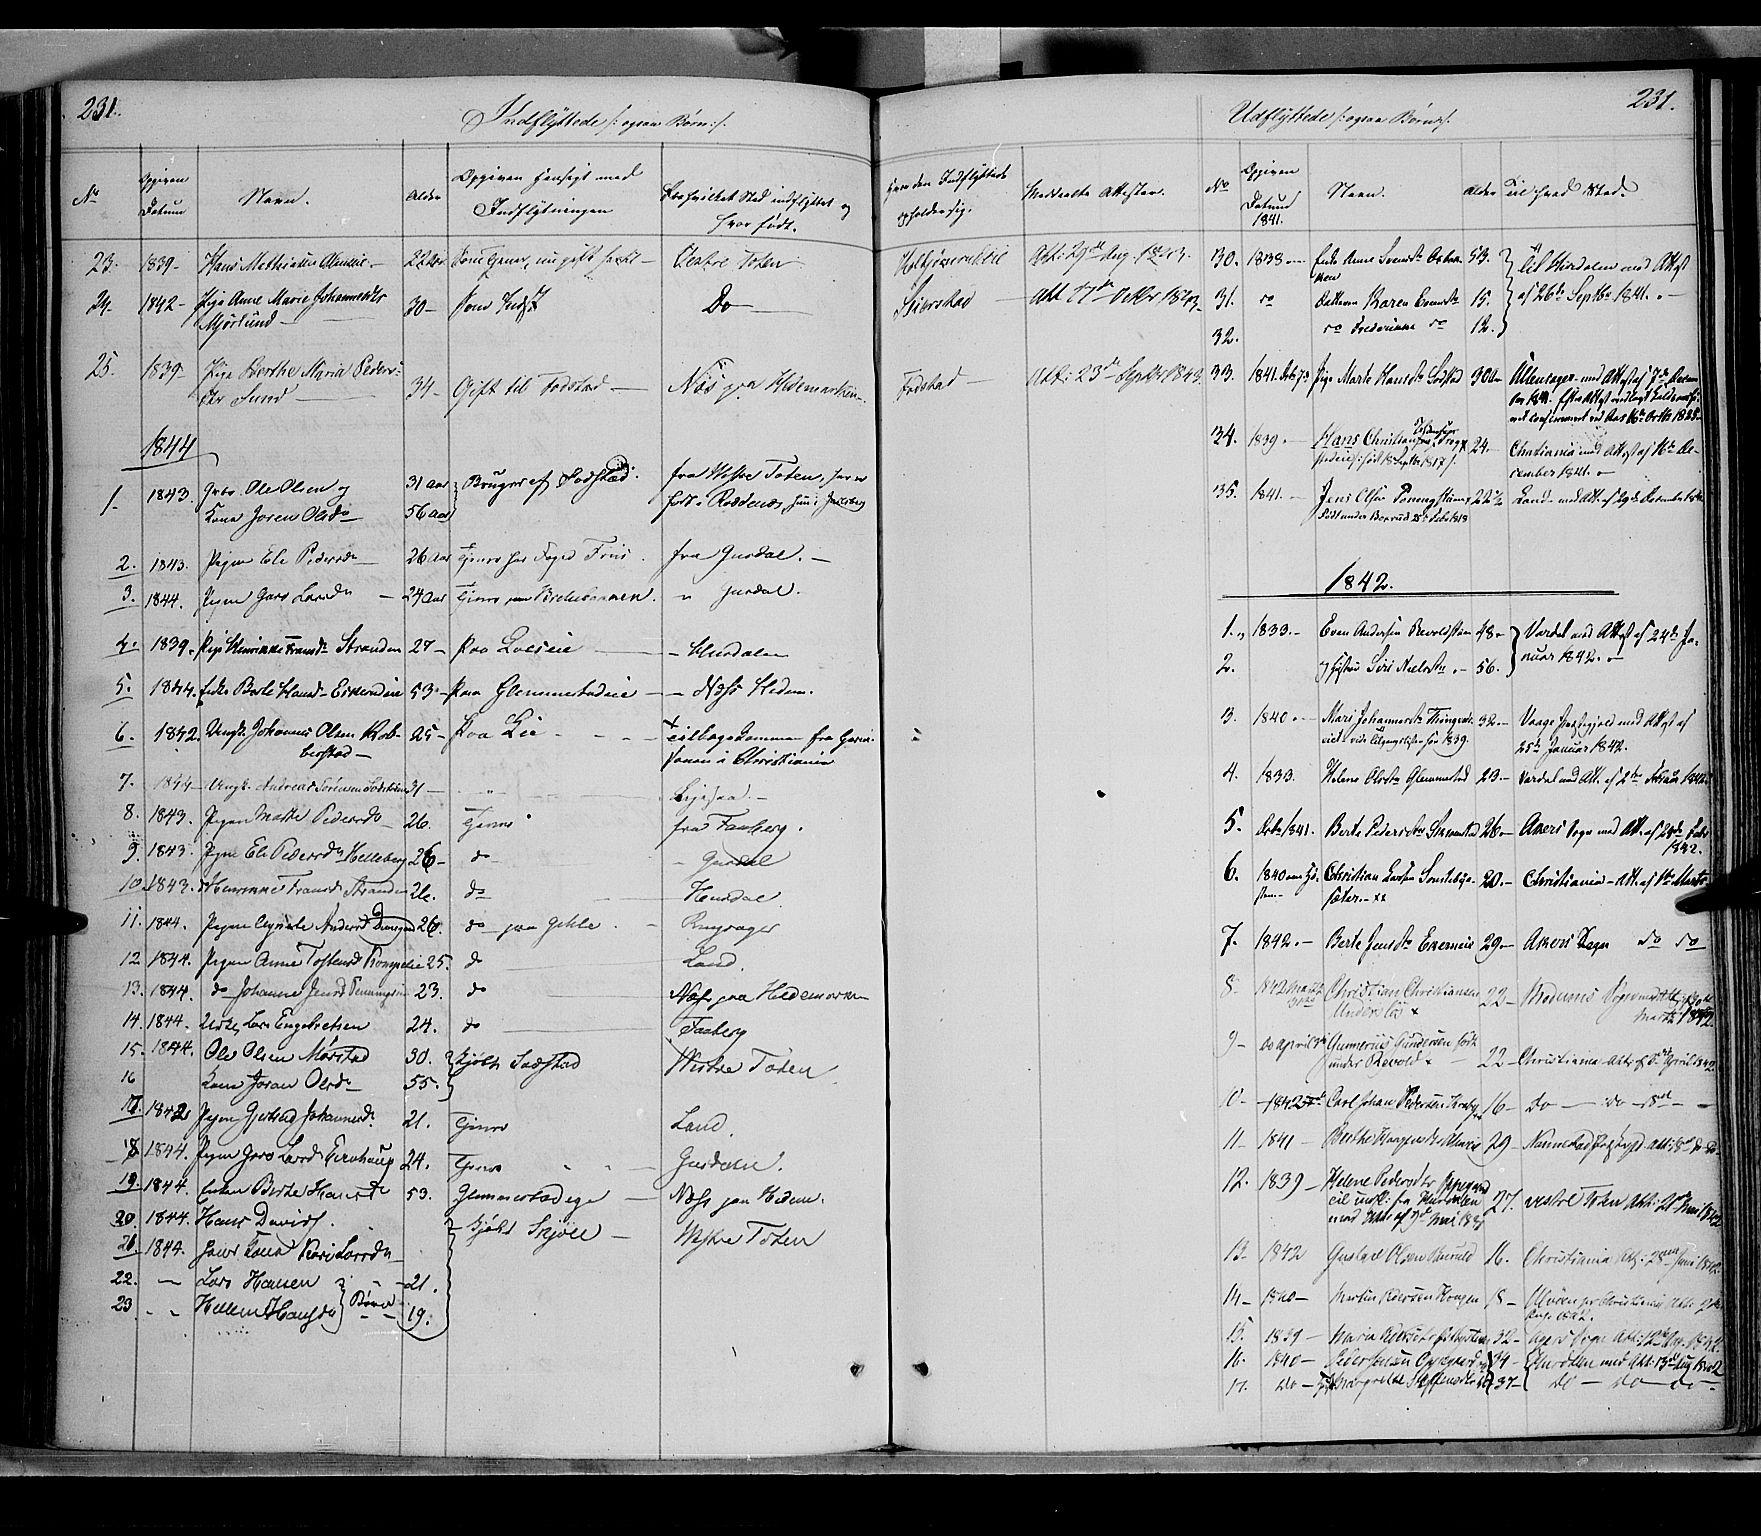 SAH, Østre Toten prestekontor, Ministerialbok nr. 2, 1840-1847, s. 231